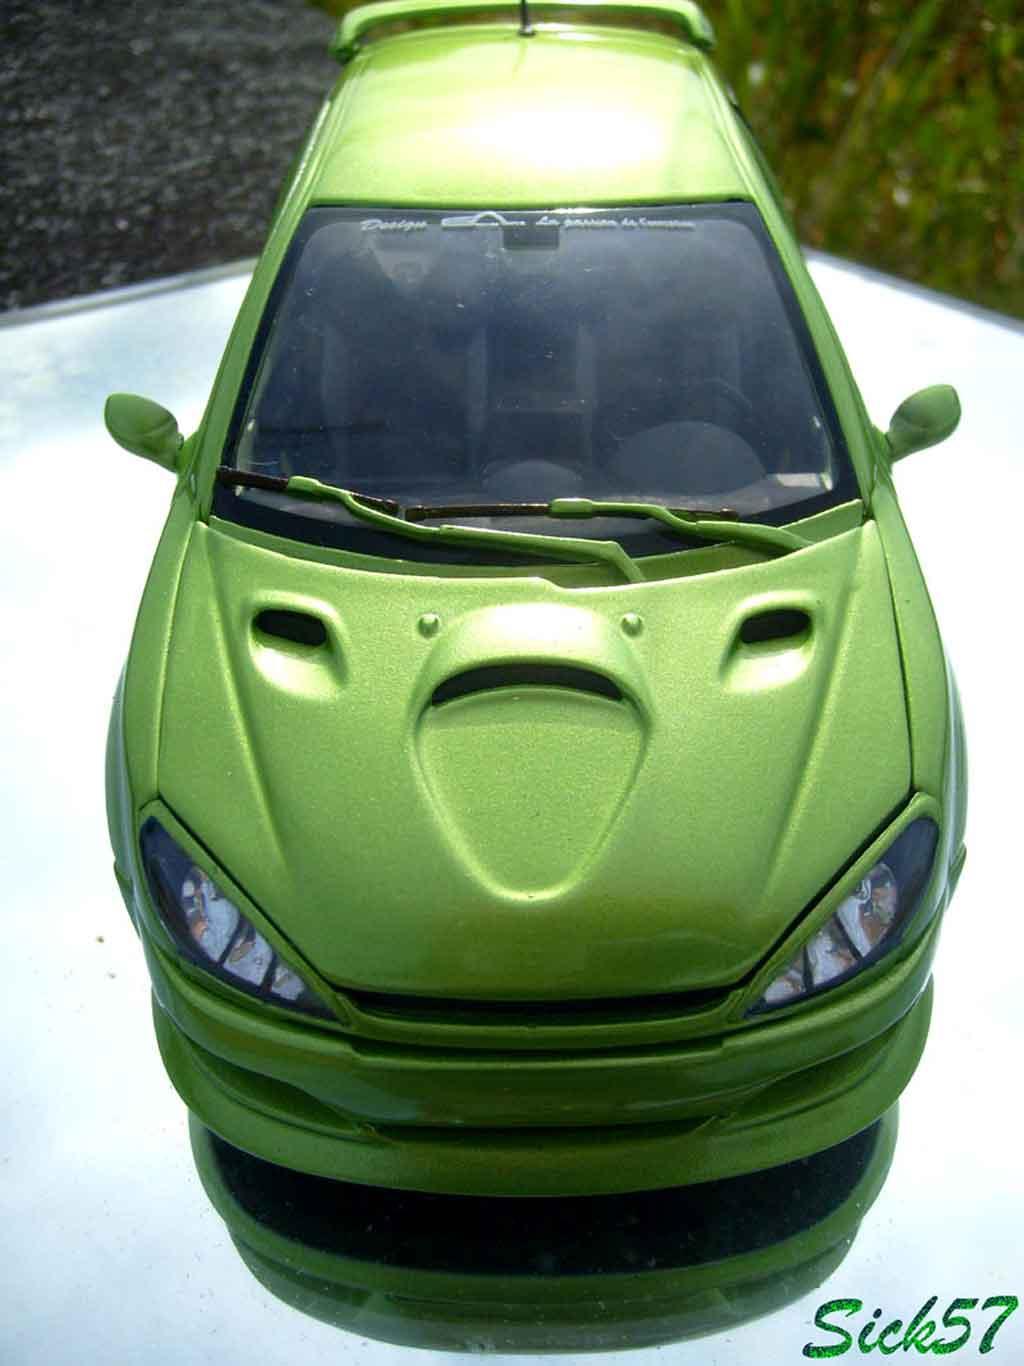 Peugeot 206 RC esquiss auto kiwi tuning Norev. Peugeot 206 RC esquiss auto kiwi miniature auto miniature 1/18